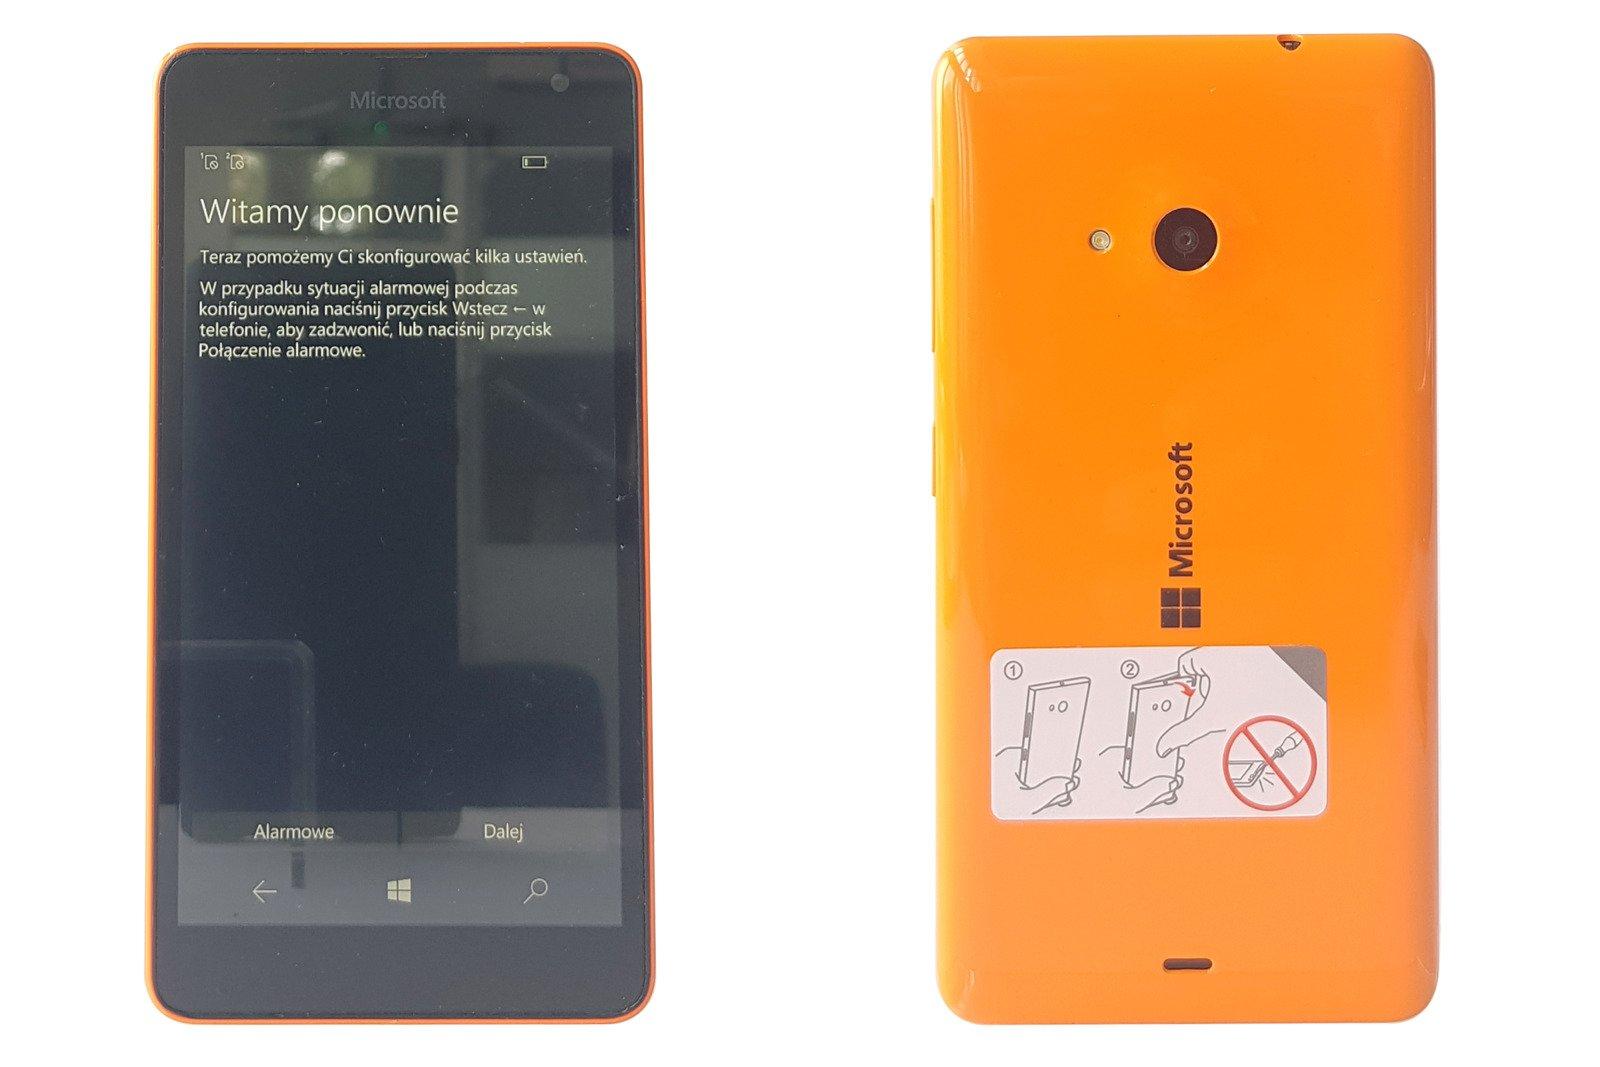 Smartphone Microsoft Lumia 535 DualSIM Orange RM-1089